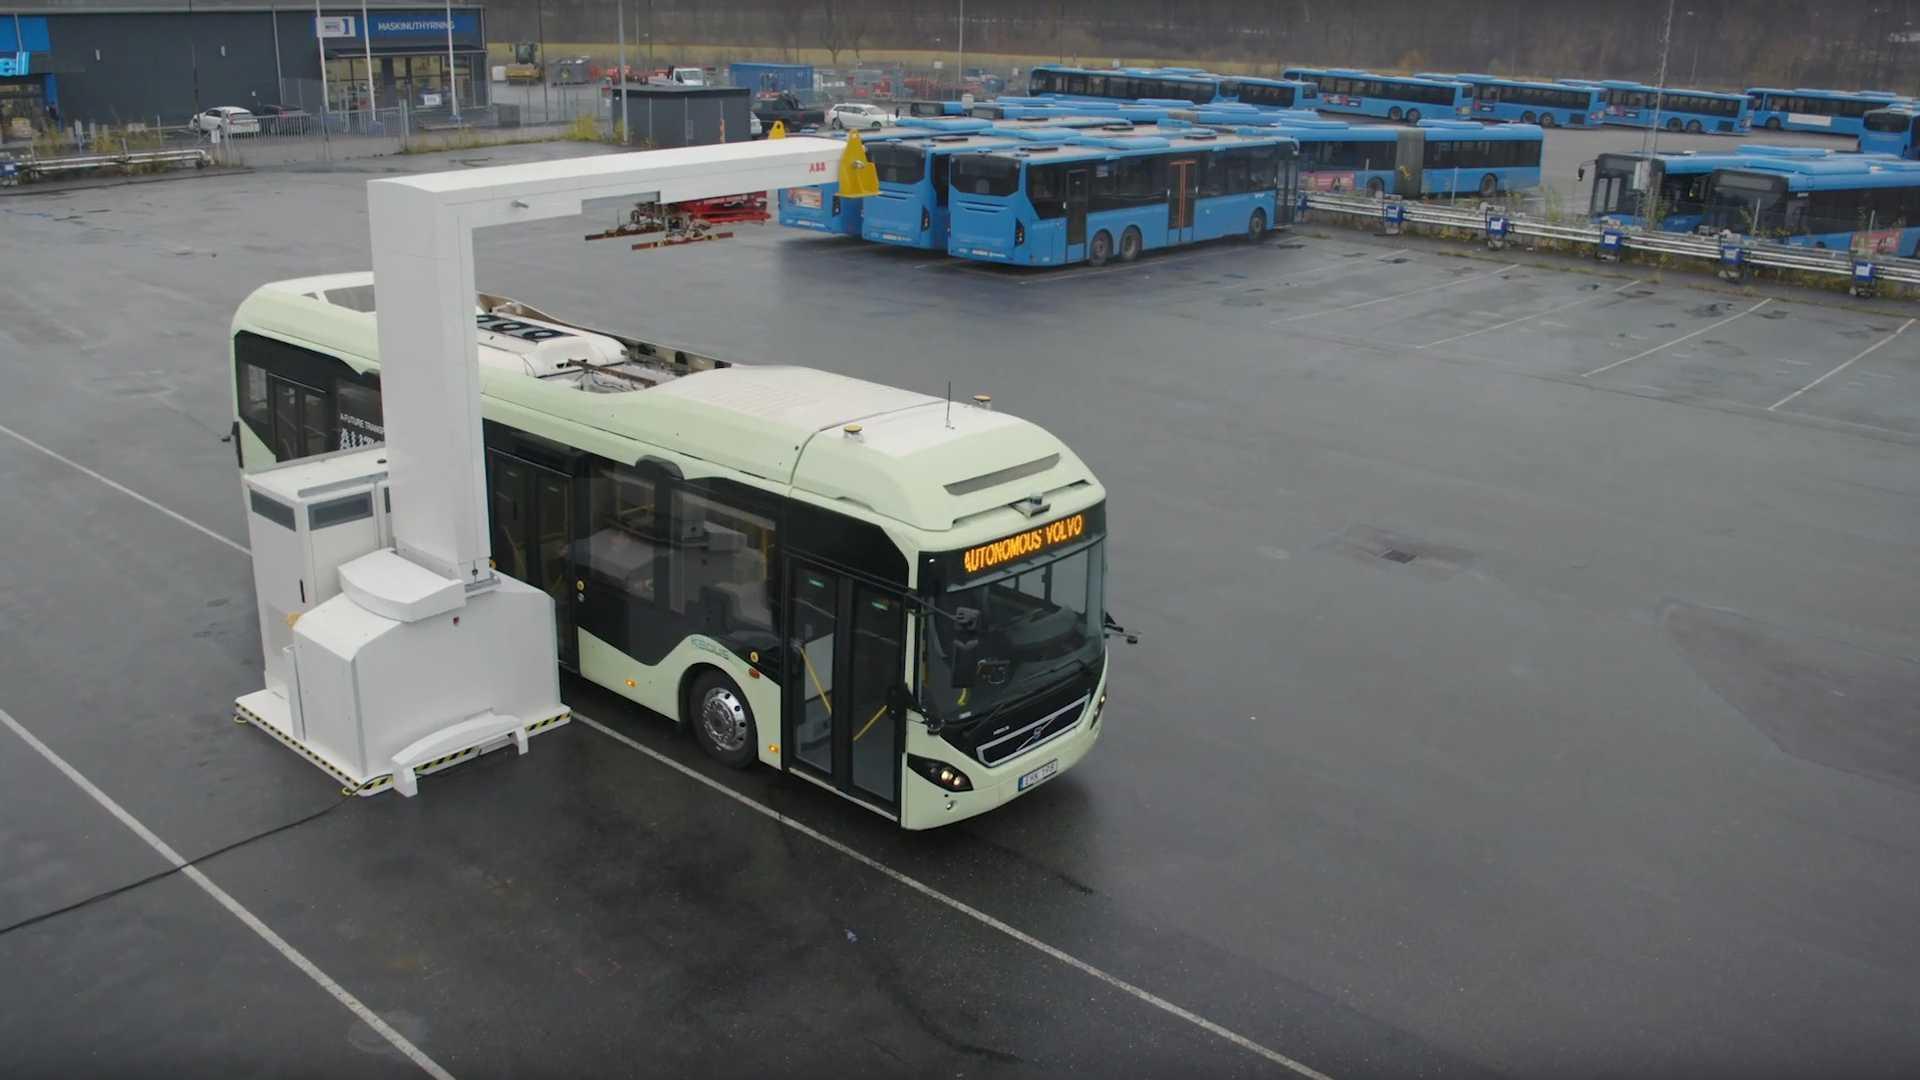 volvo-autonomous-bus-in-the-depot